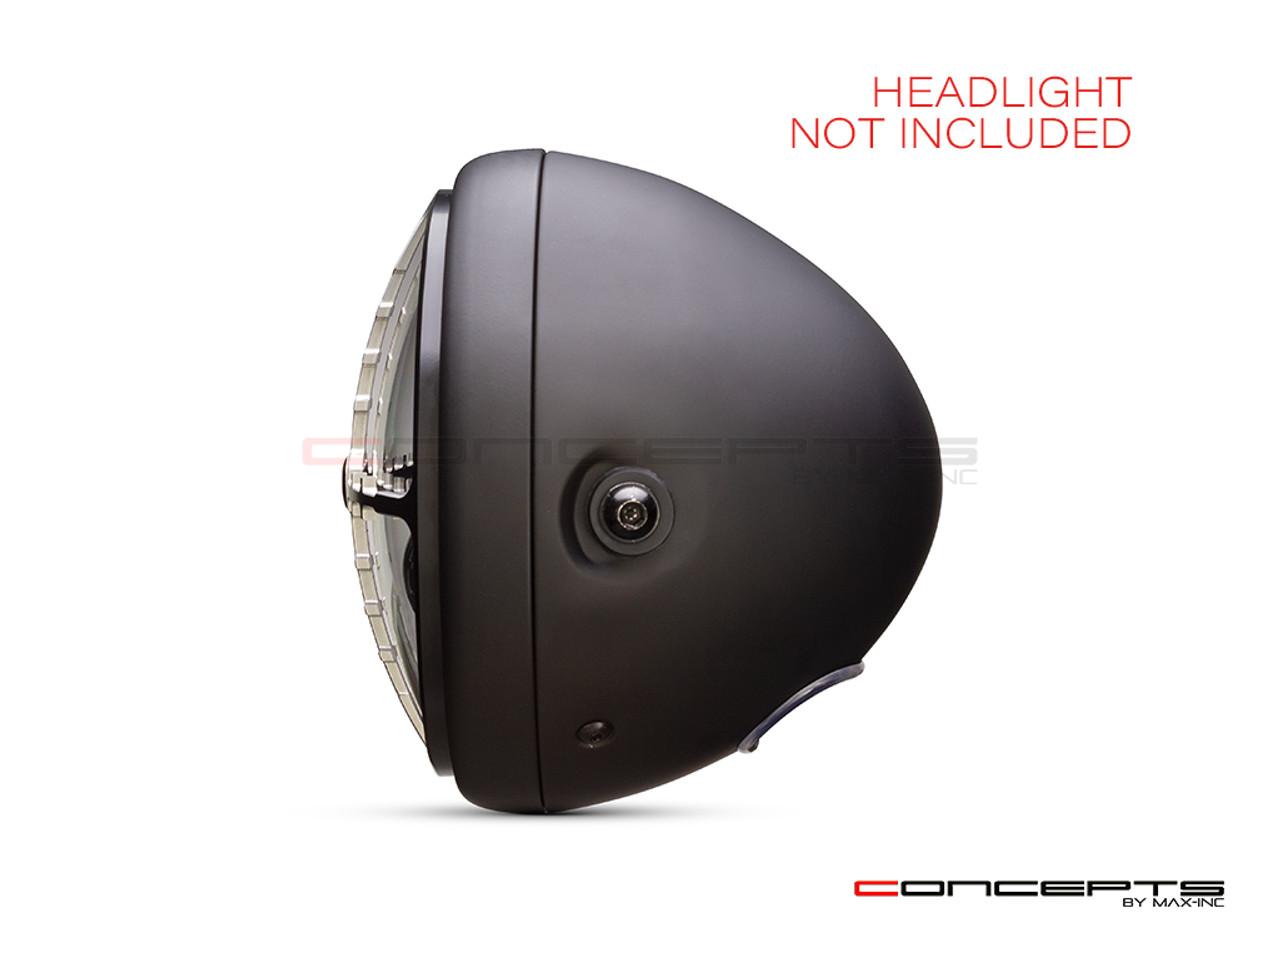 "7"" Cross Hairs Grille Design Black + Contrast CNC Aluminum Headlight Guard Cover"